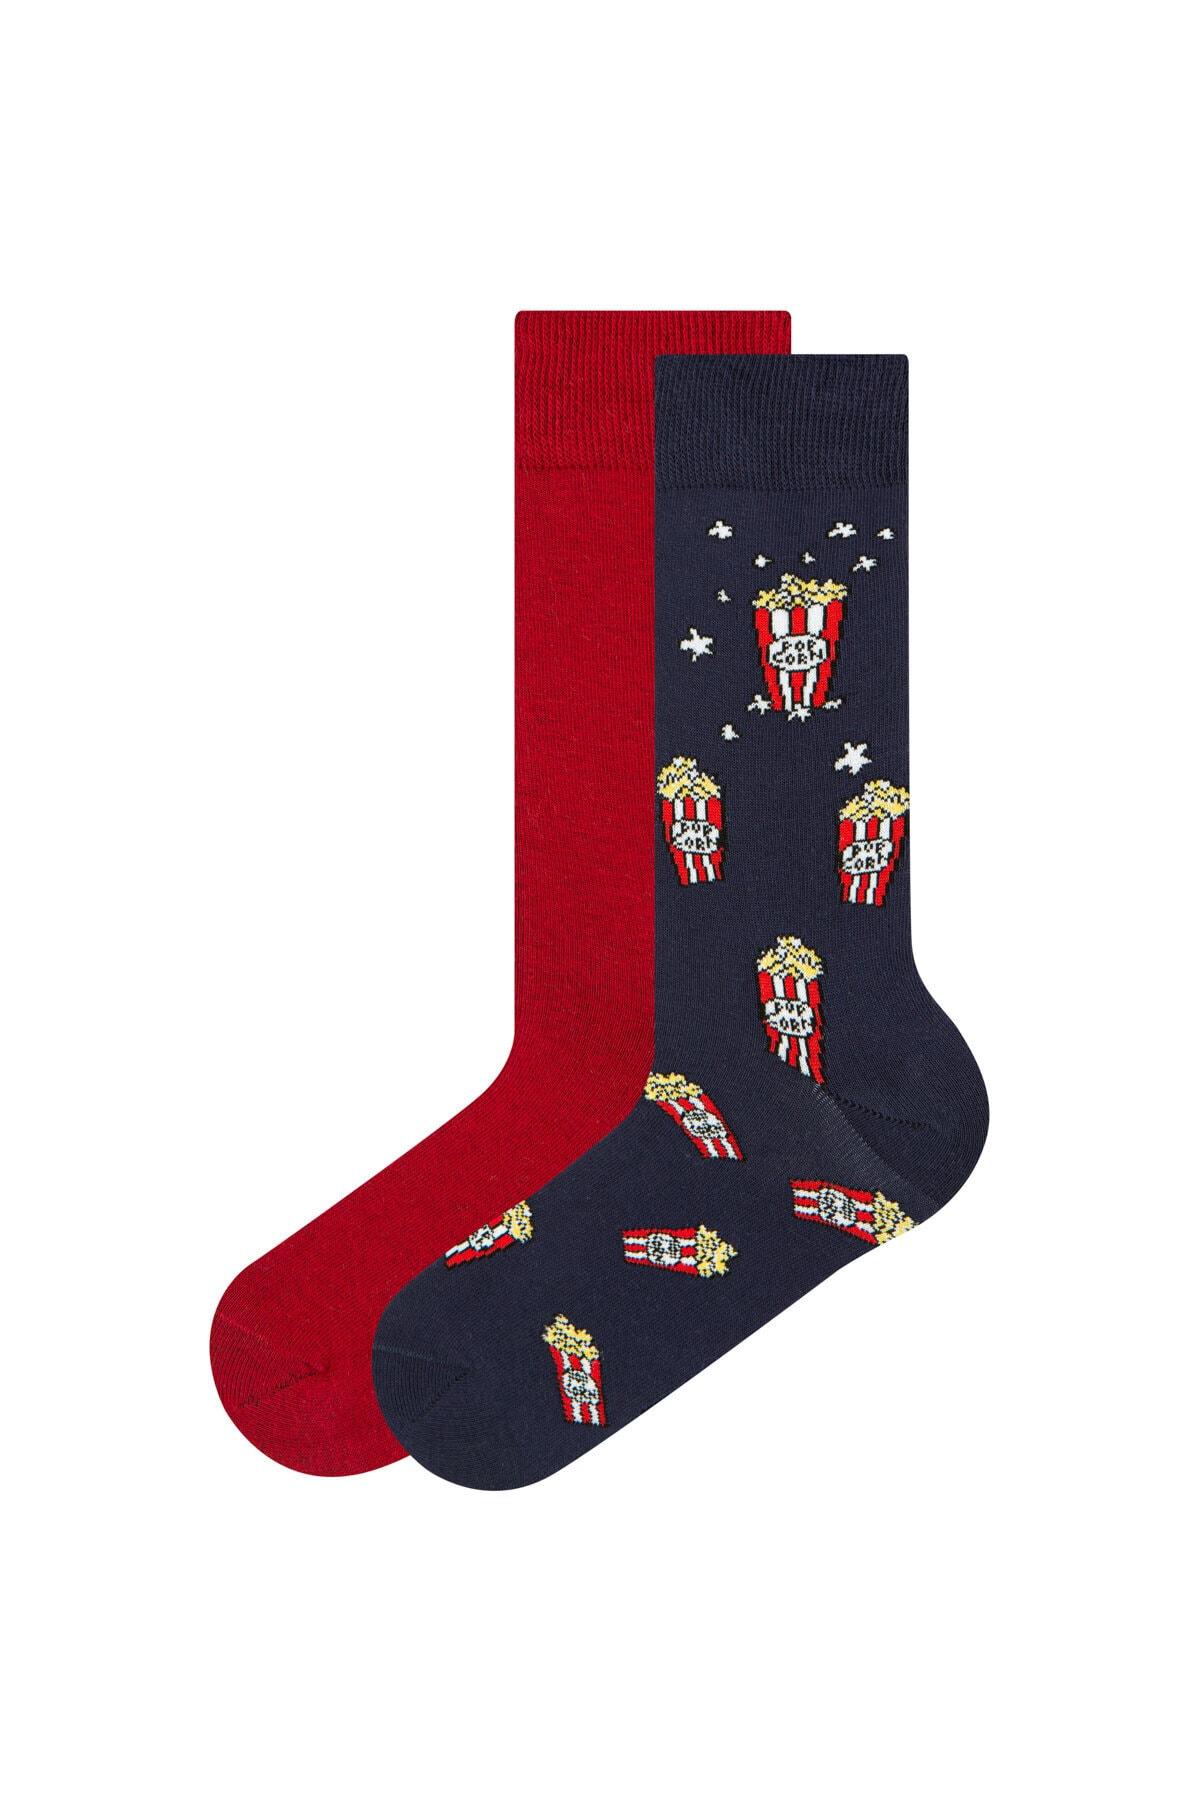 Penti Lacivert - Bordo Erkek Popcorn 2li Soket Çorap